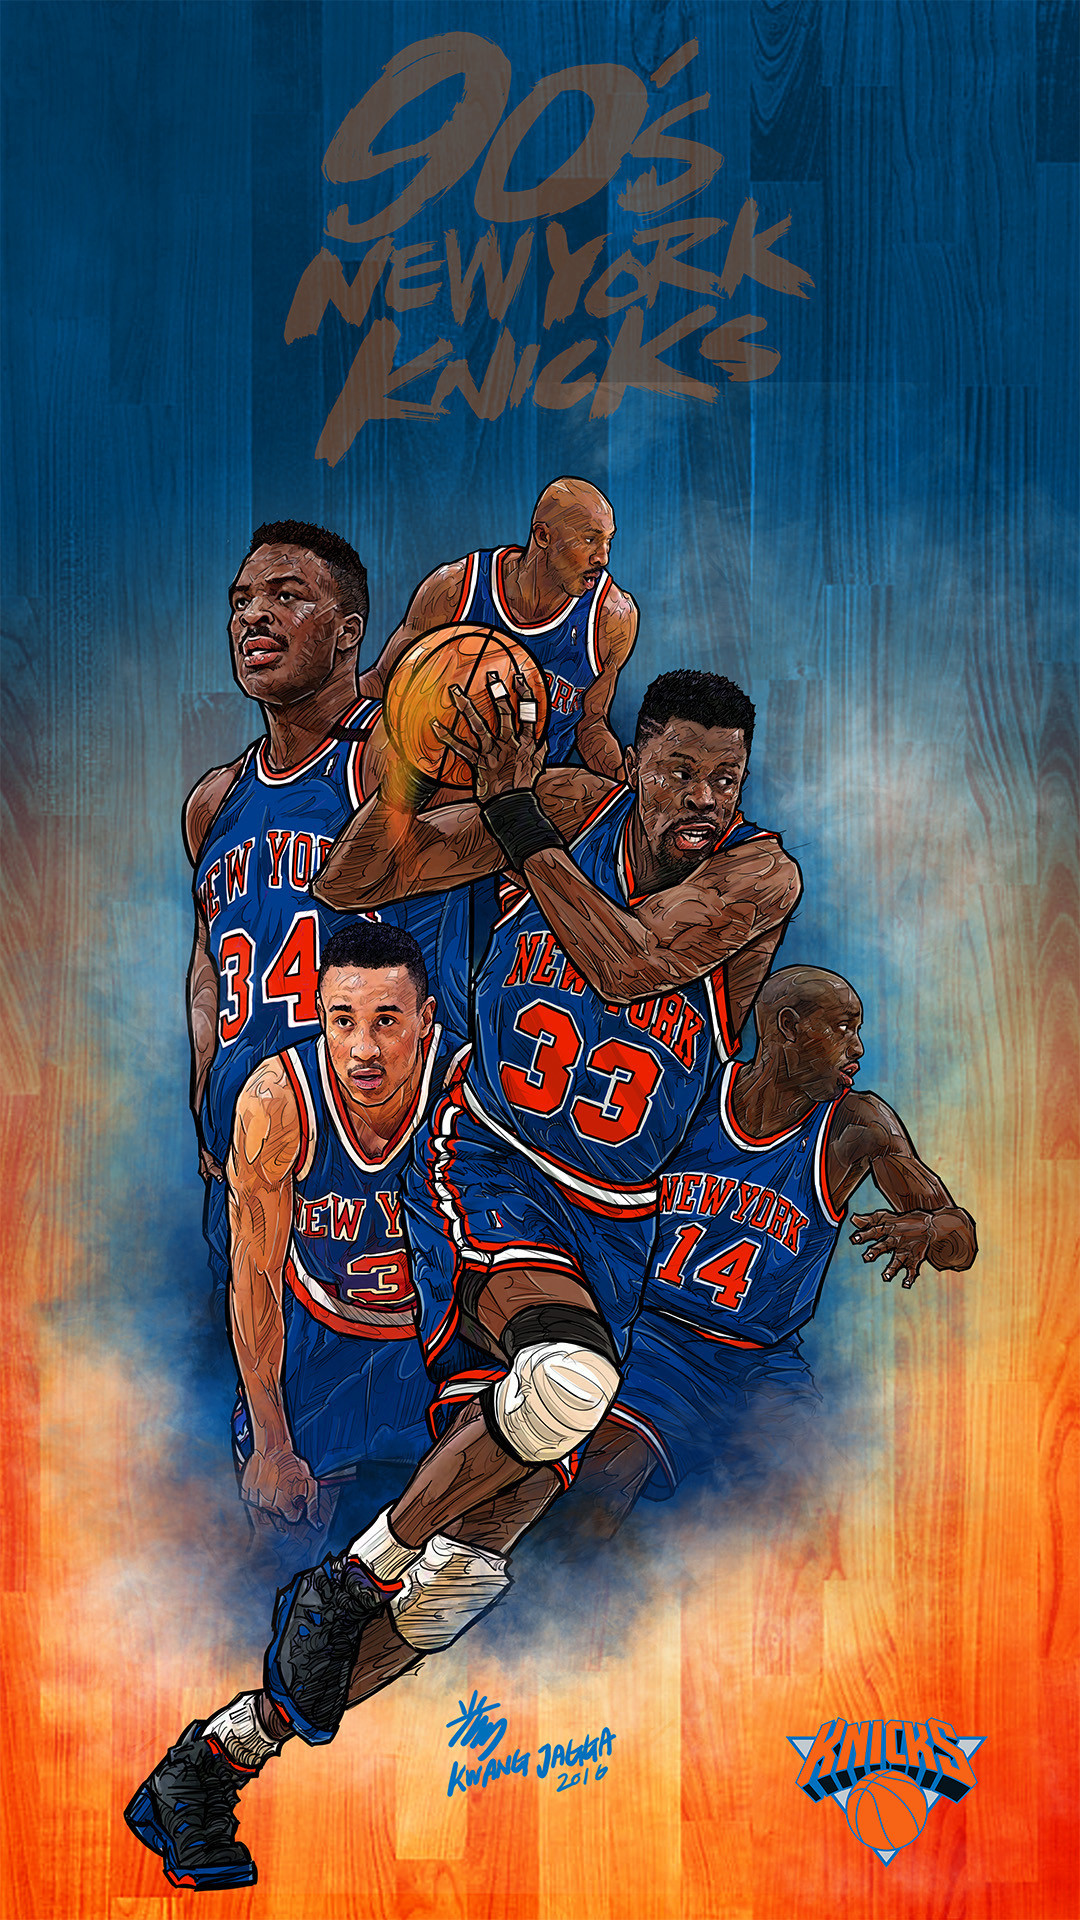 Nba Basketball Wallpaper 2018 67 Pictures